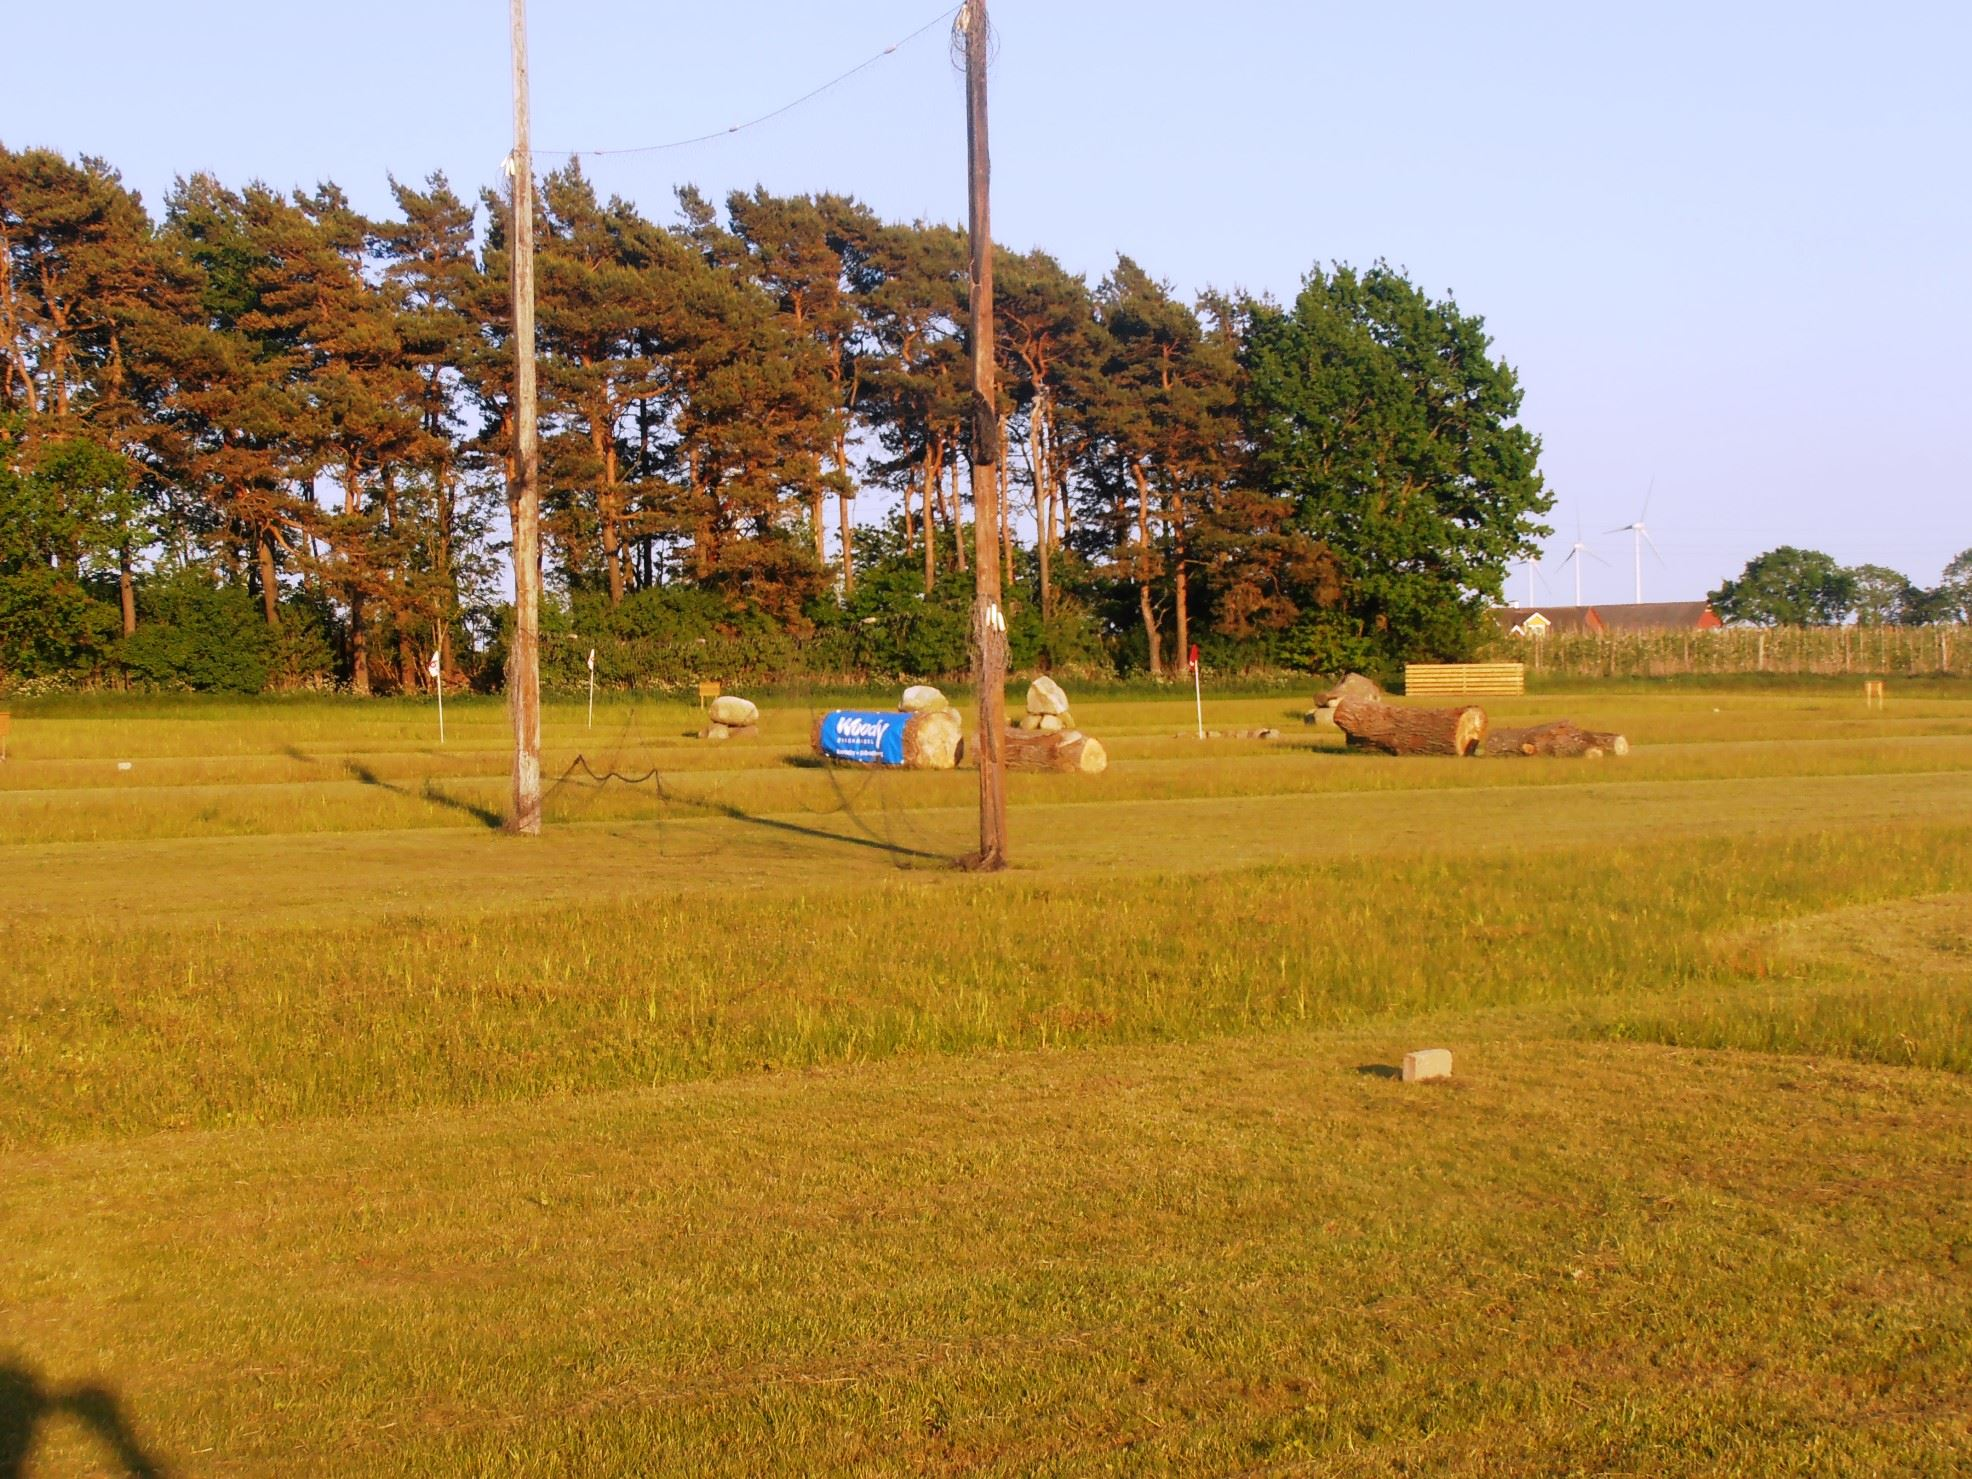 Blekinge Fussball Golf - Ysane